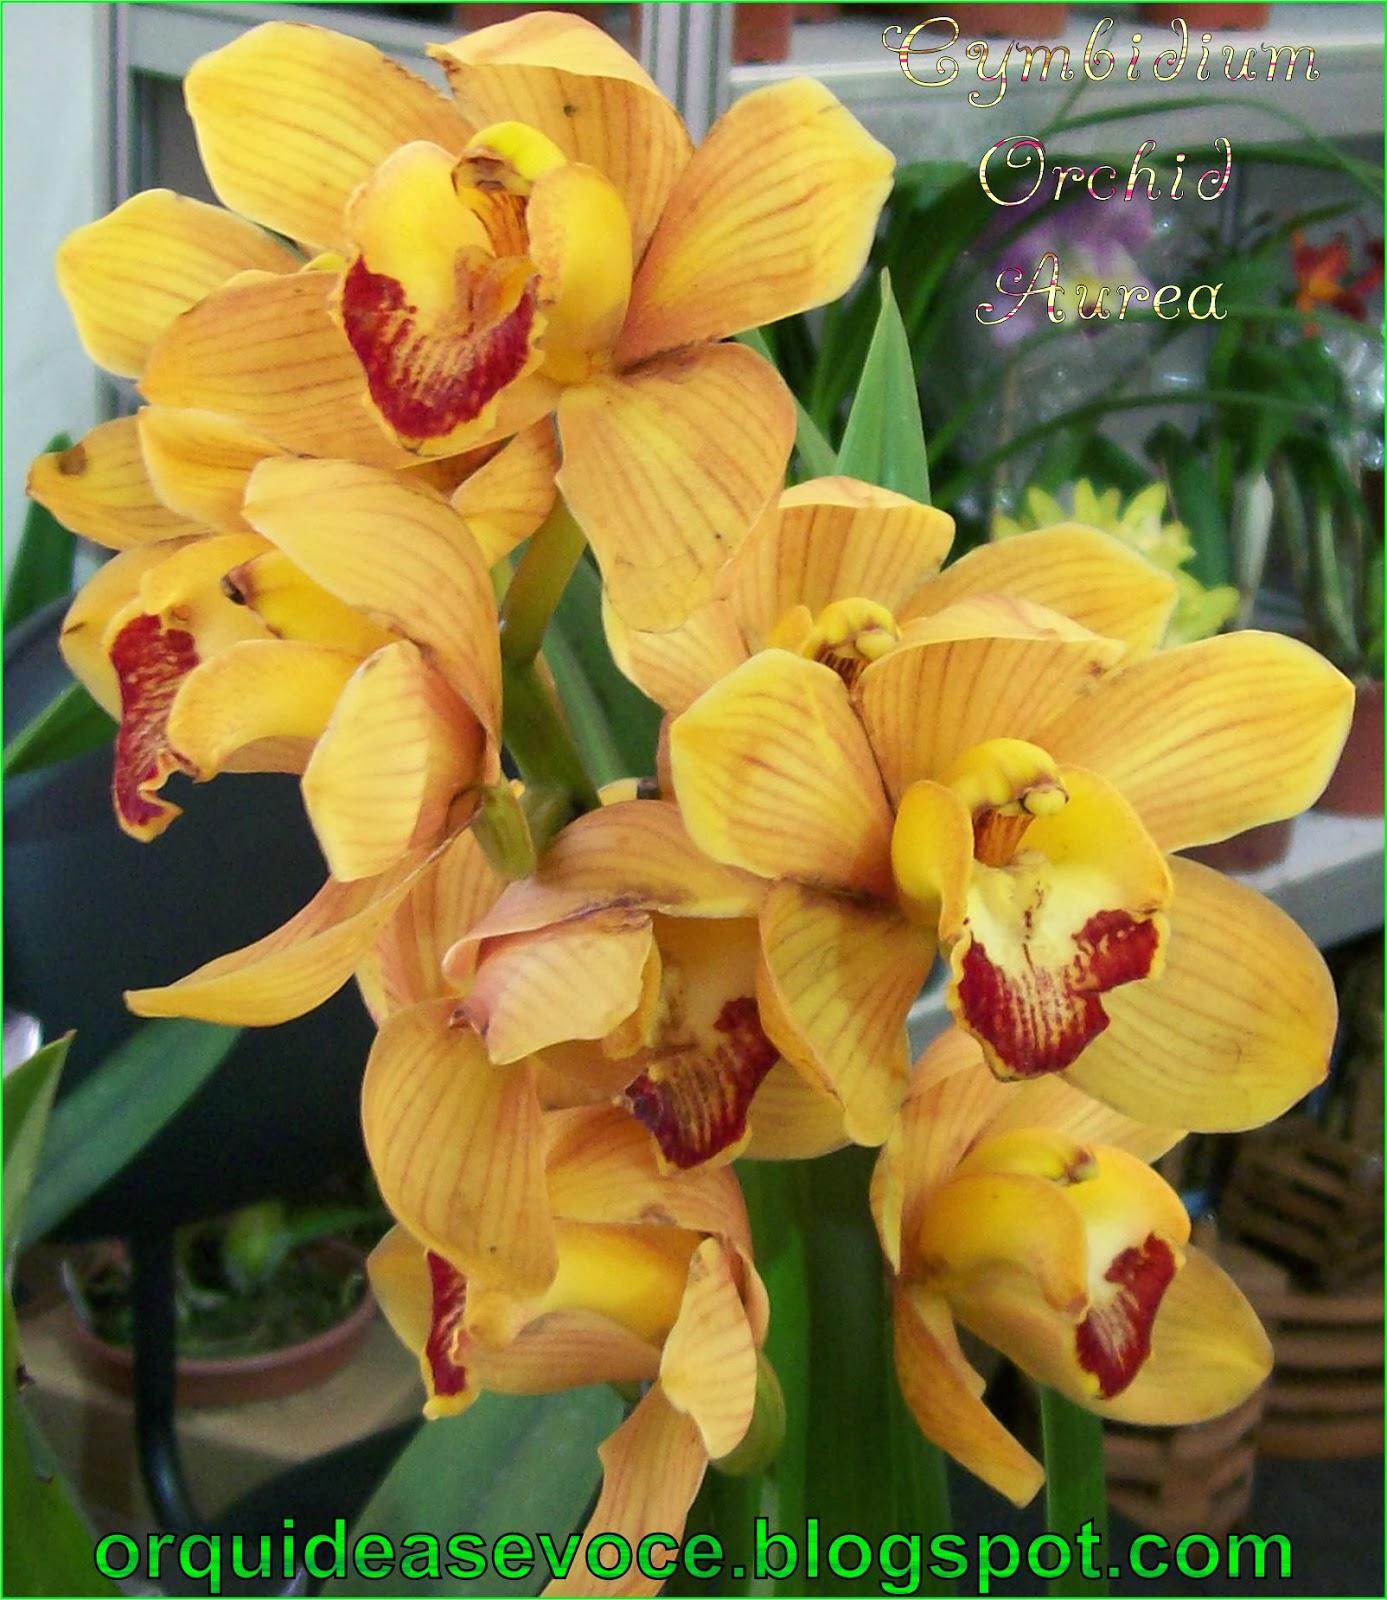 Cymbidium Orchid Aurea